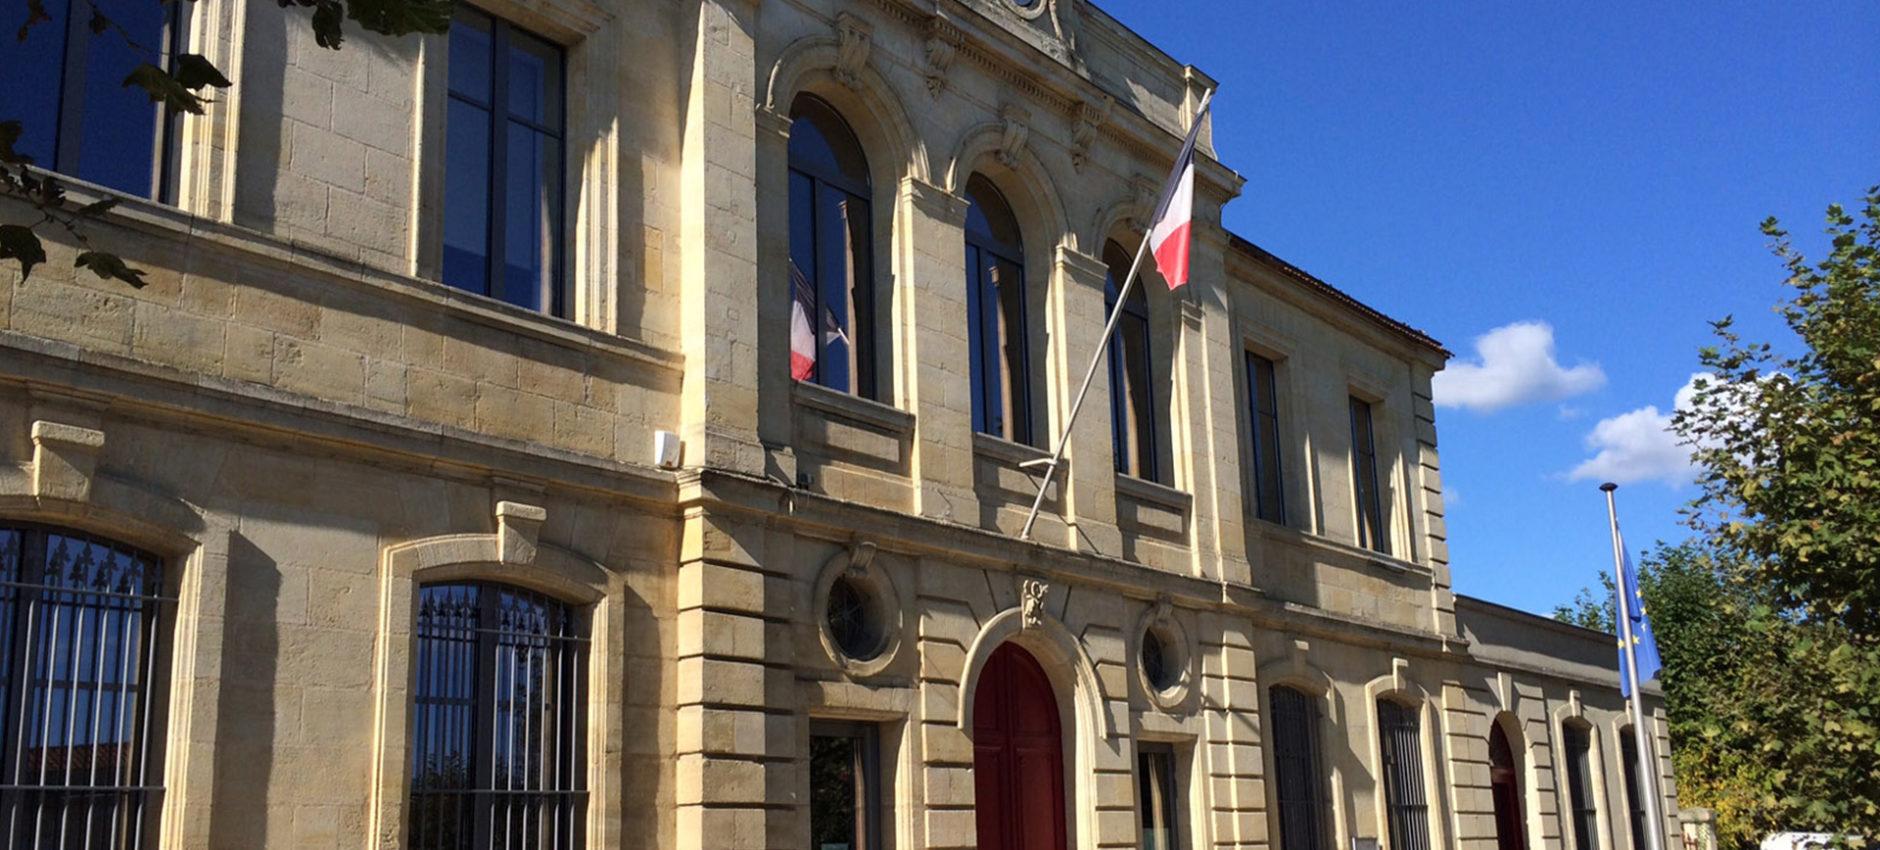 boca_architecture_projet_mairie_beautiran_01.jpg